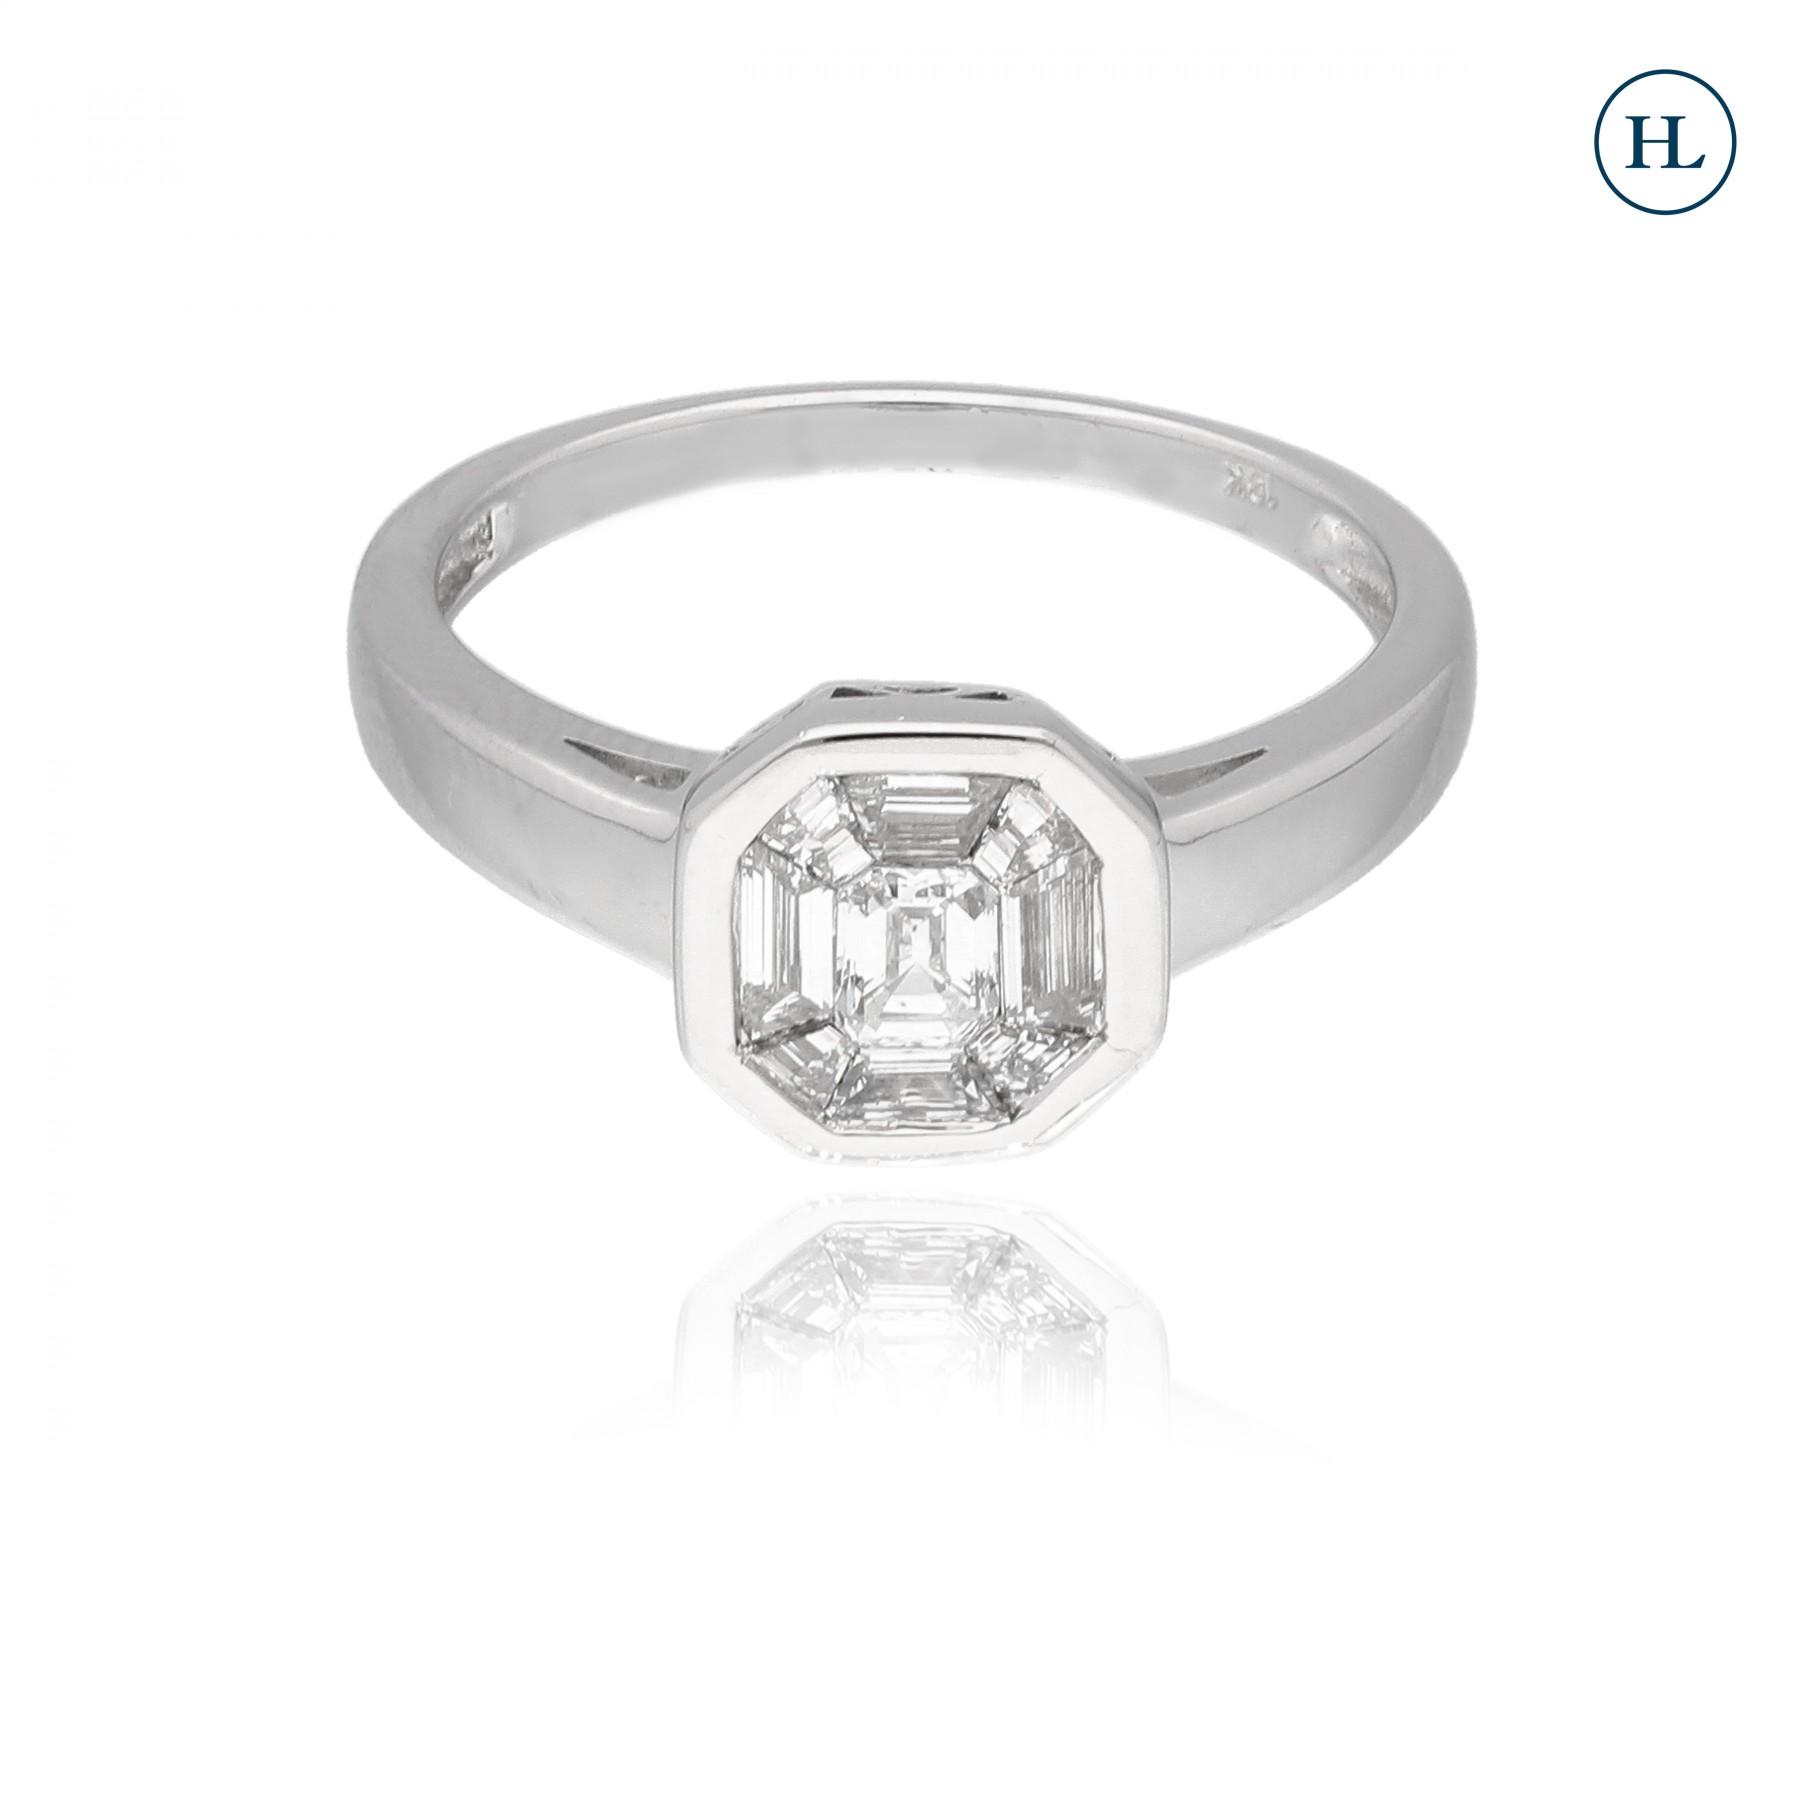 Serenity Diamond Ring